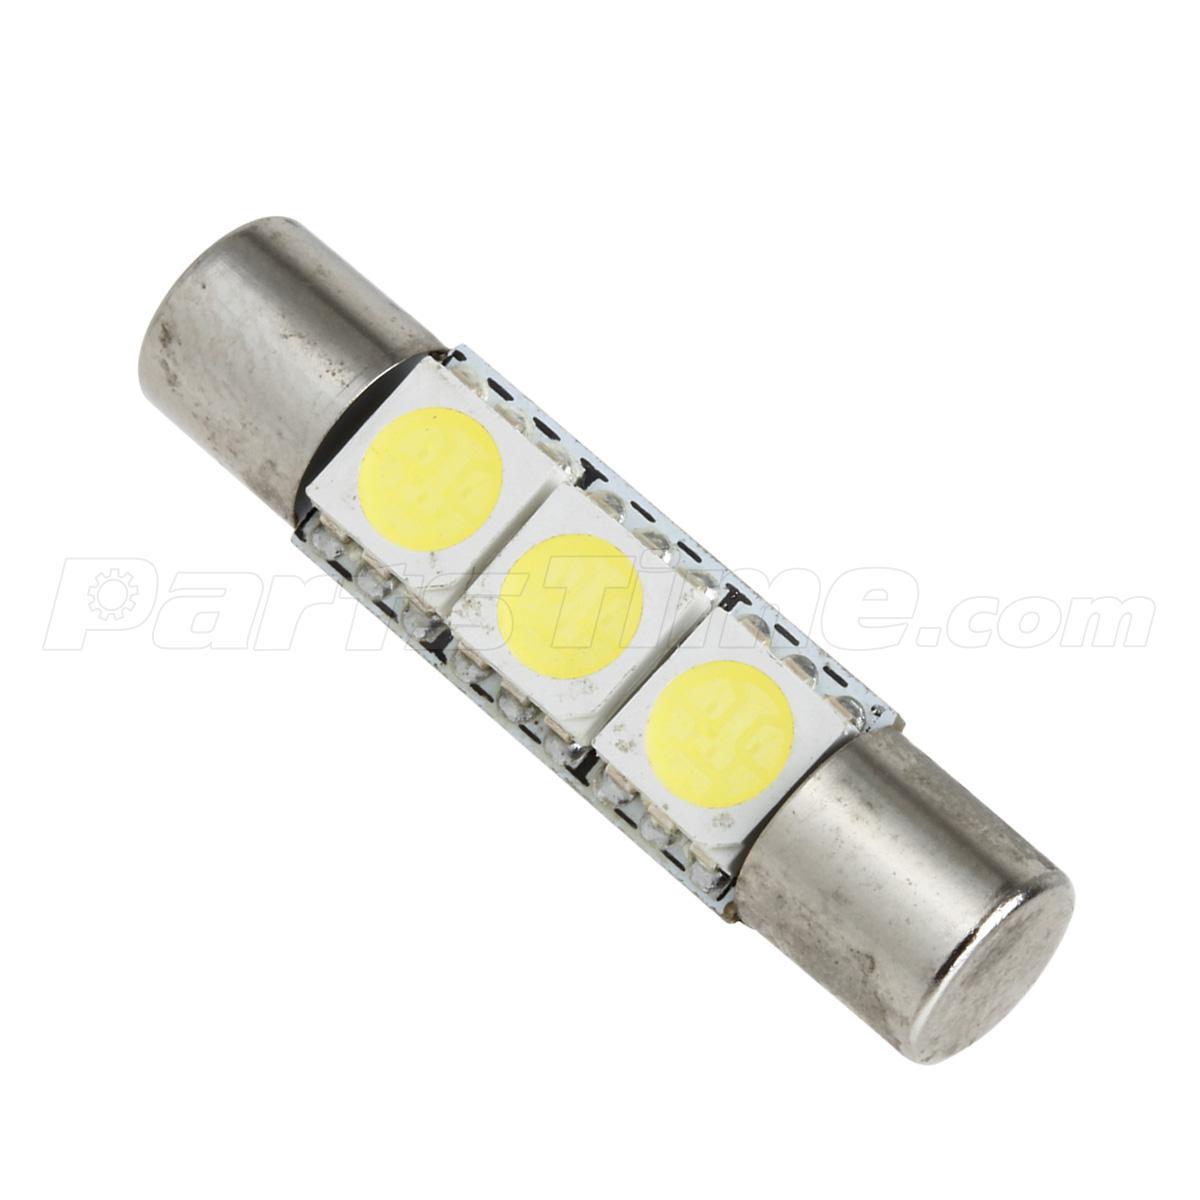 10x Xenon White 3SMD 5050 LED Bulbs Interior Sun Visor Vanity Mirror Lights 6641 eBay